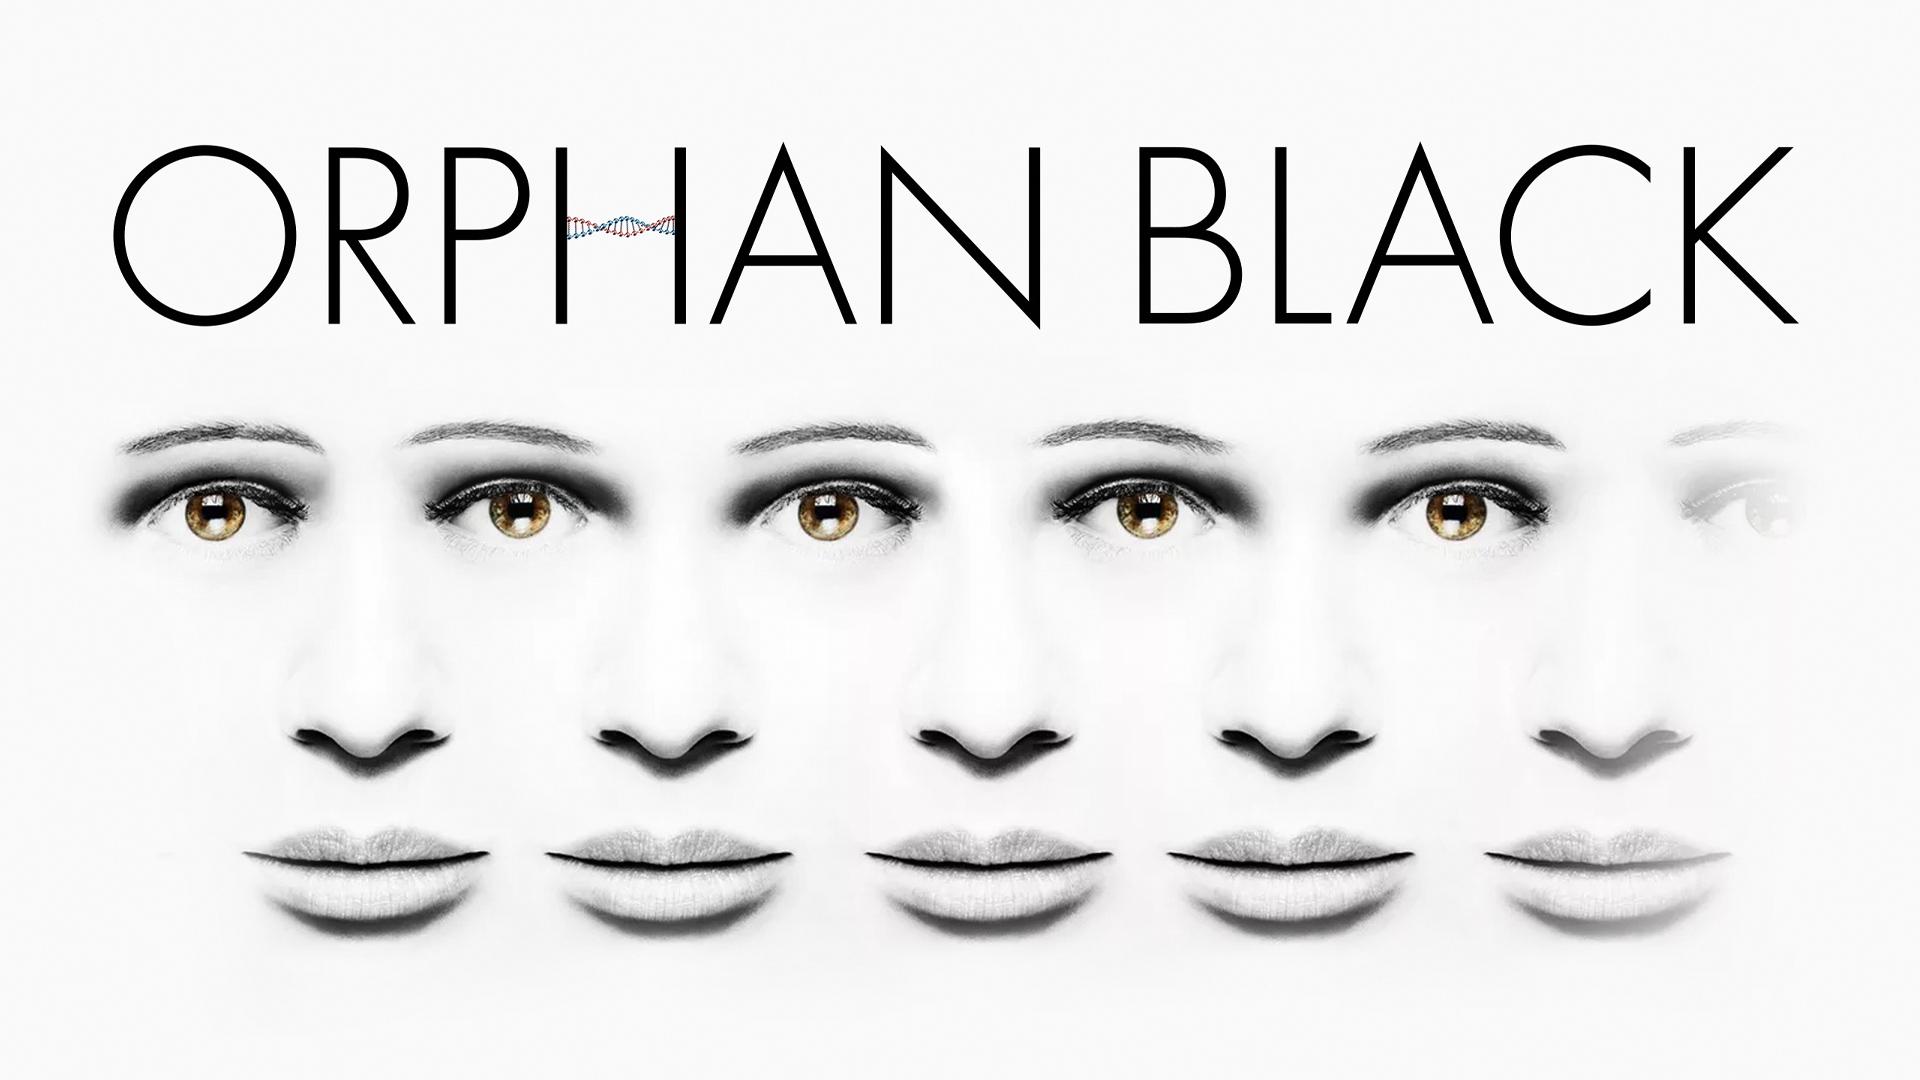 Orphan Black, Season 1